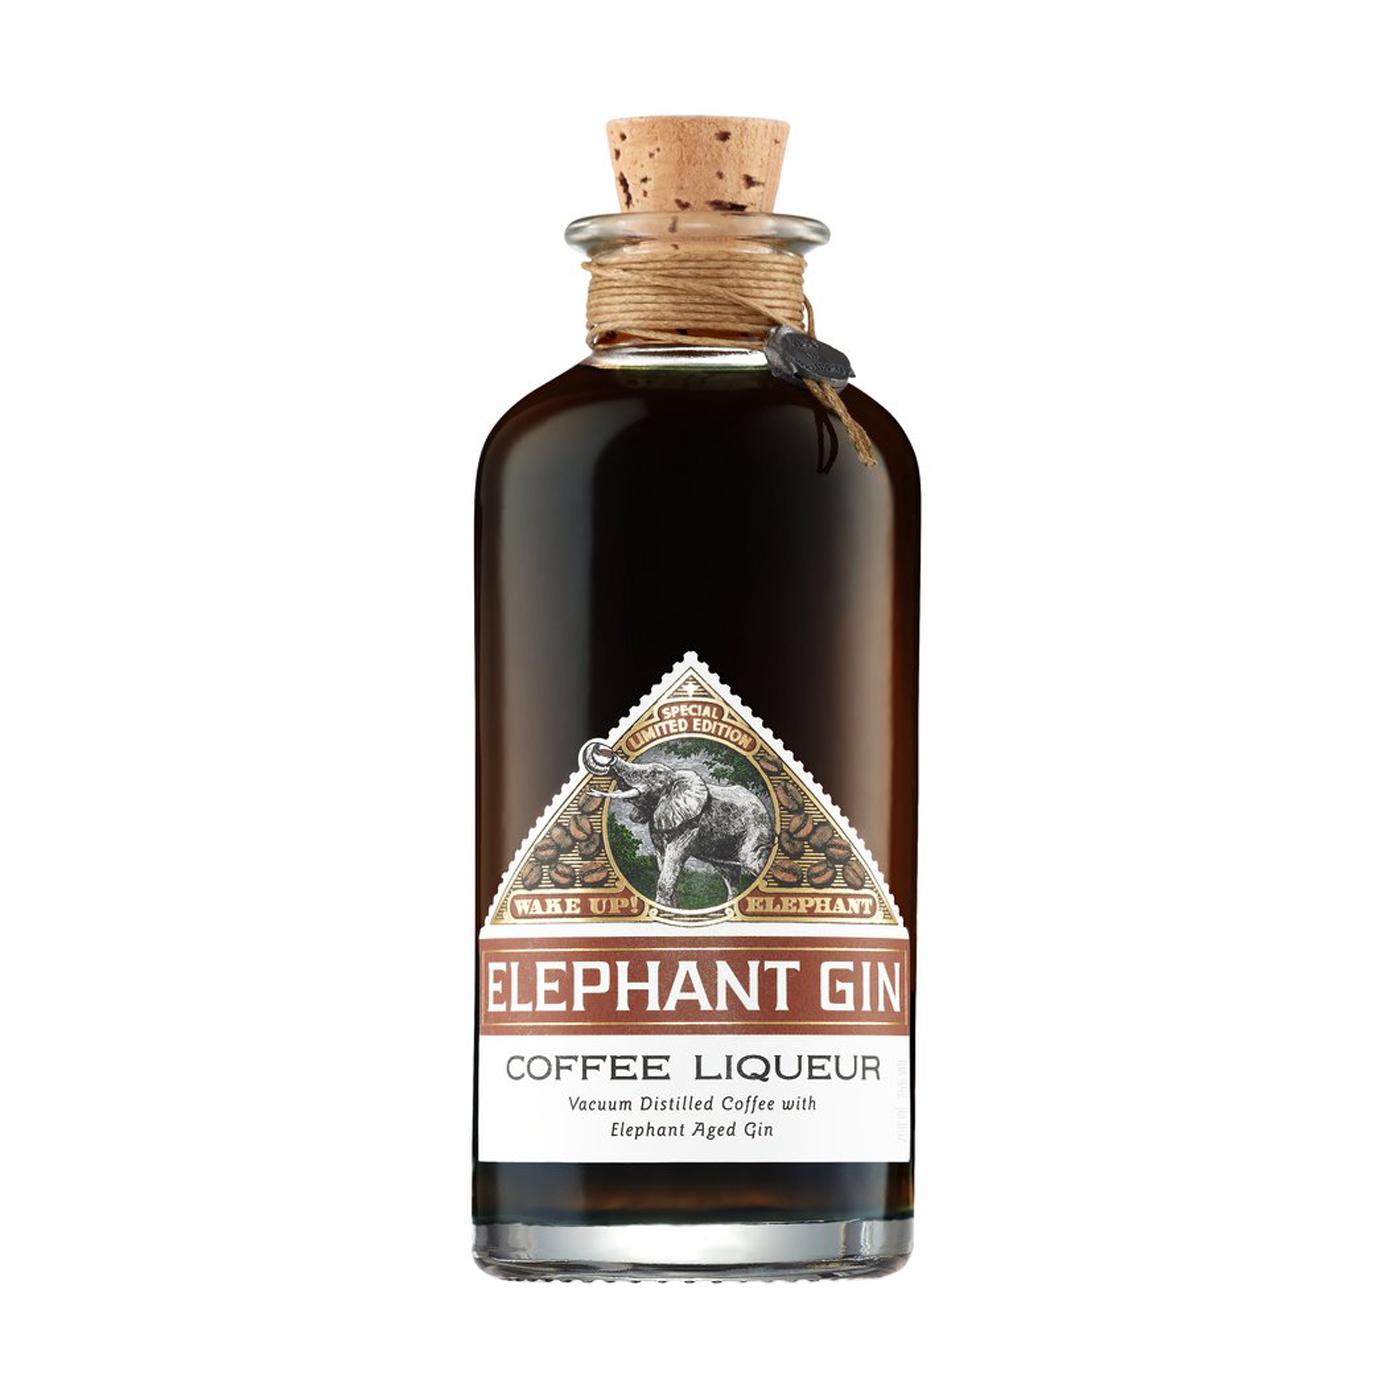 Elephant Gin Coffee Liqueur